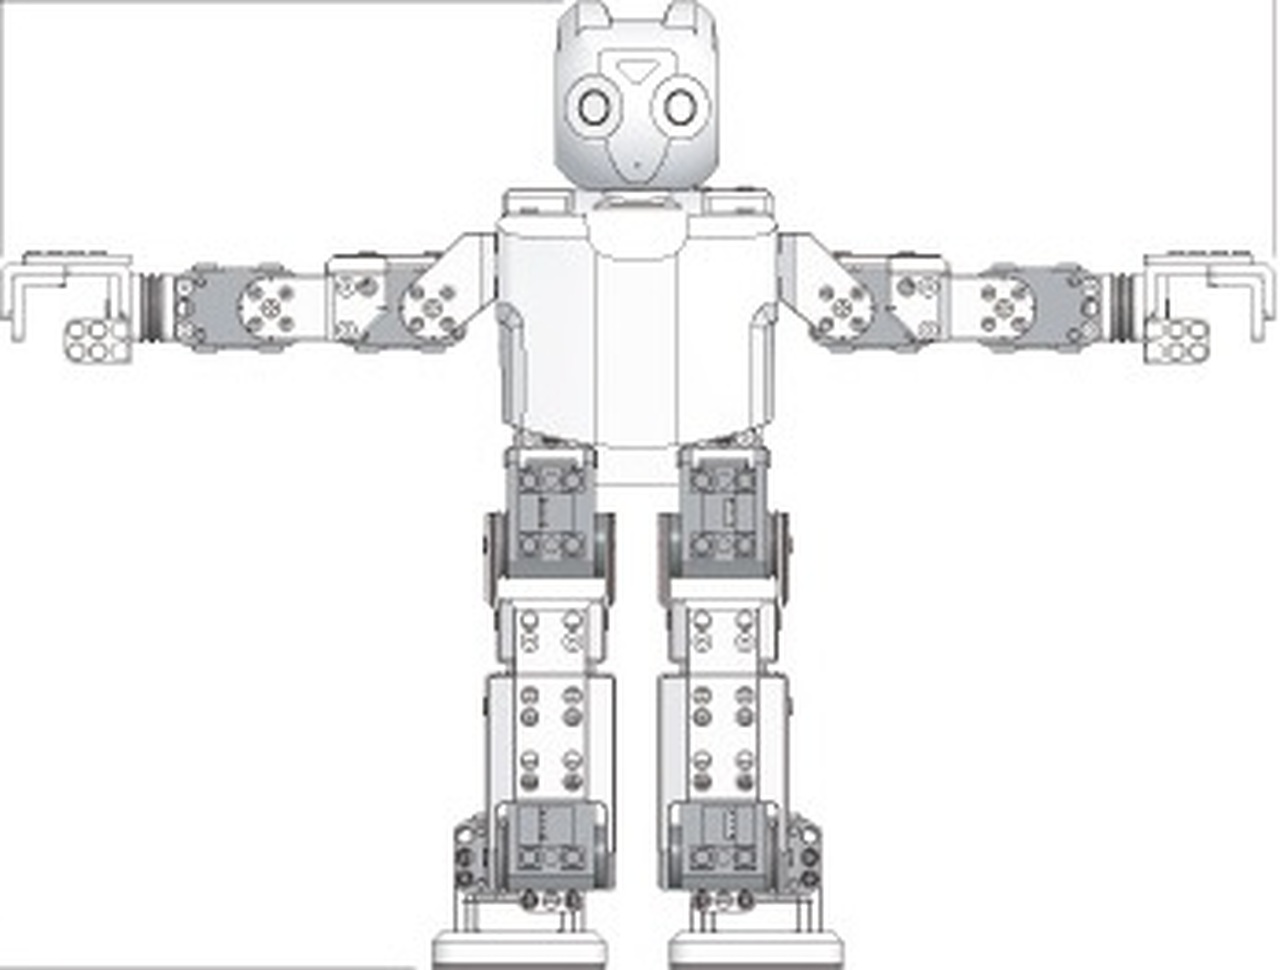 ROBOTIS-MINI (DARWIN) Assembling Service